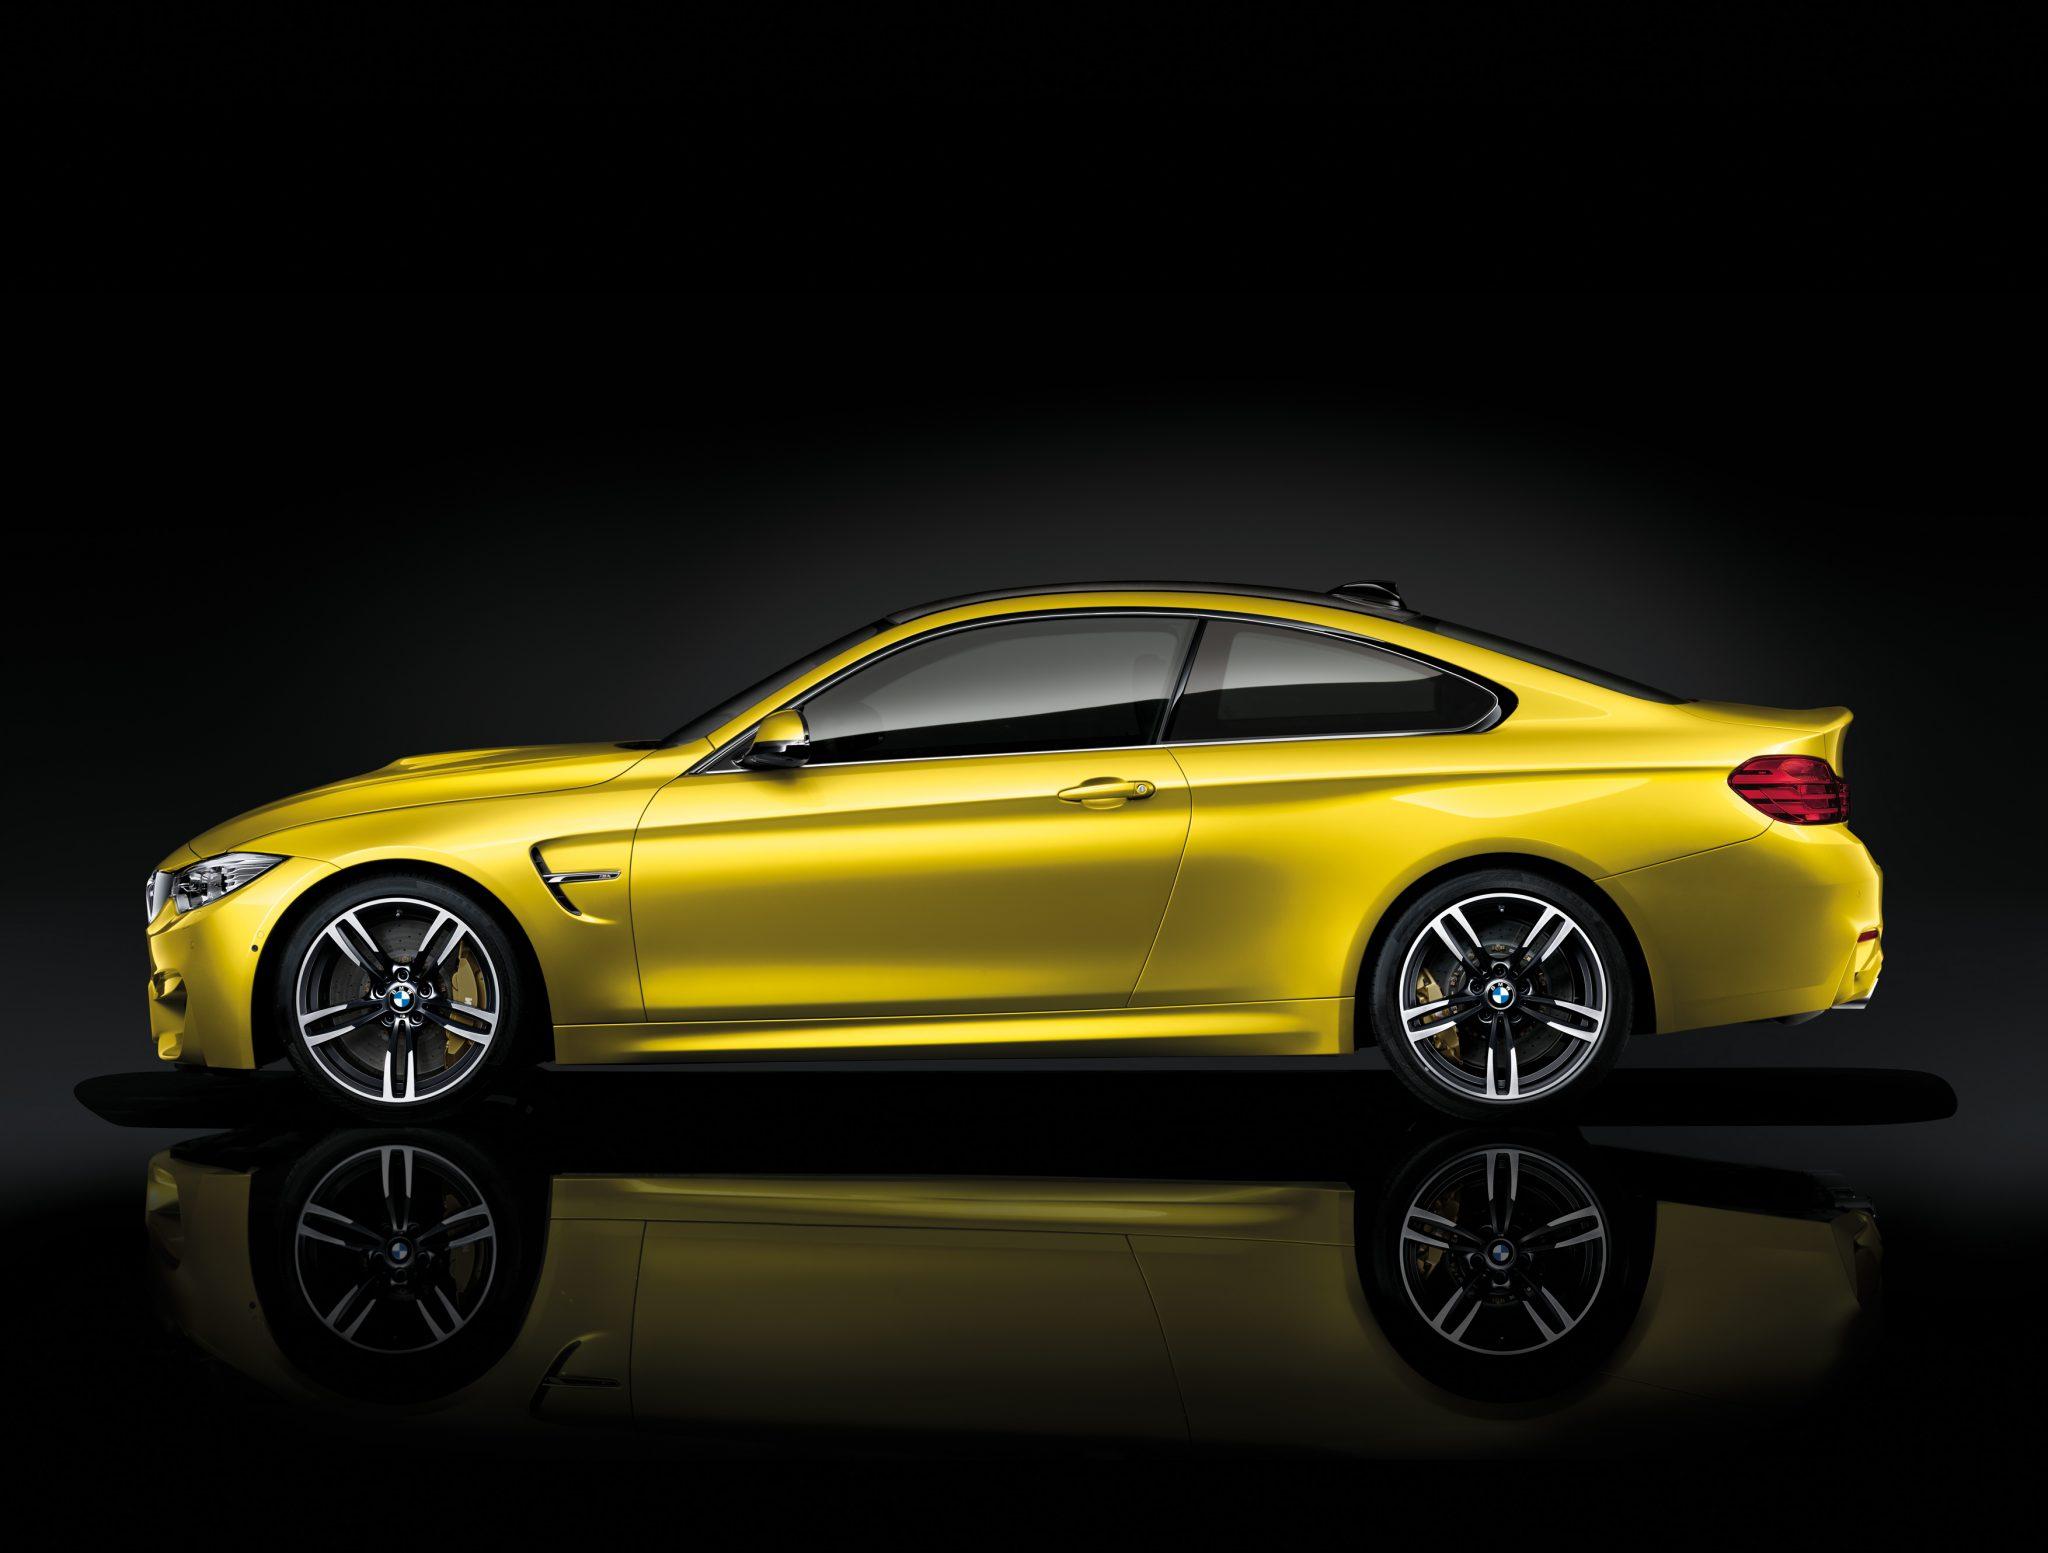 BMW M4 Coupe Photos